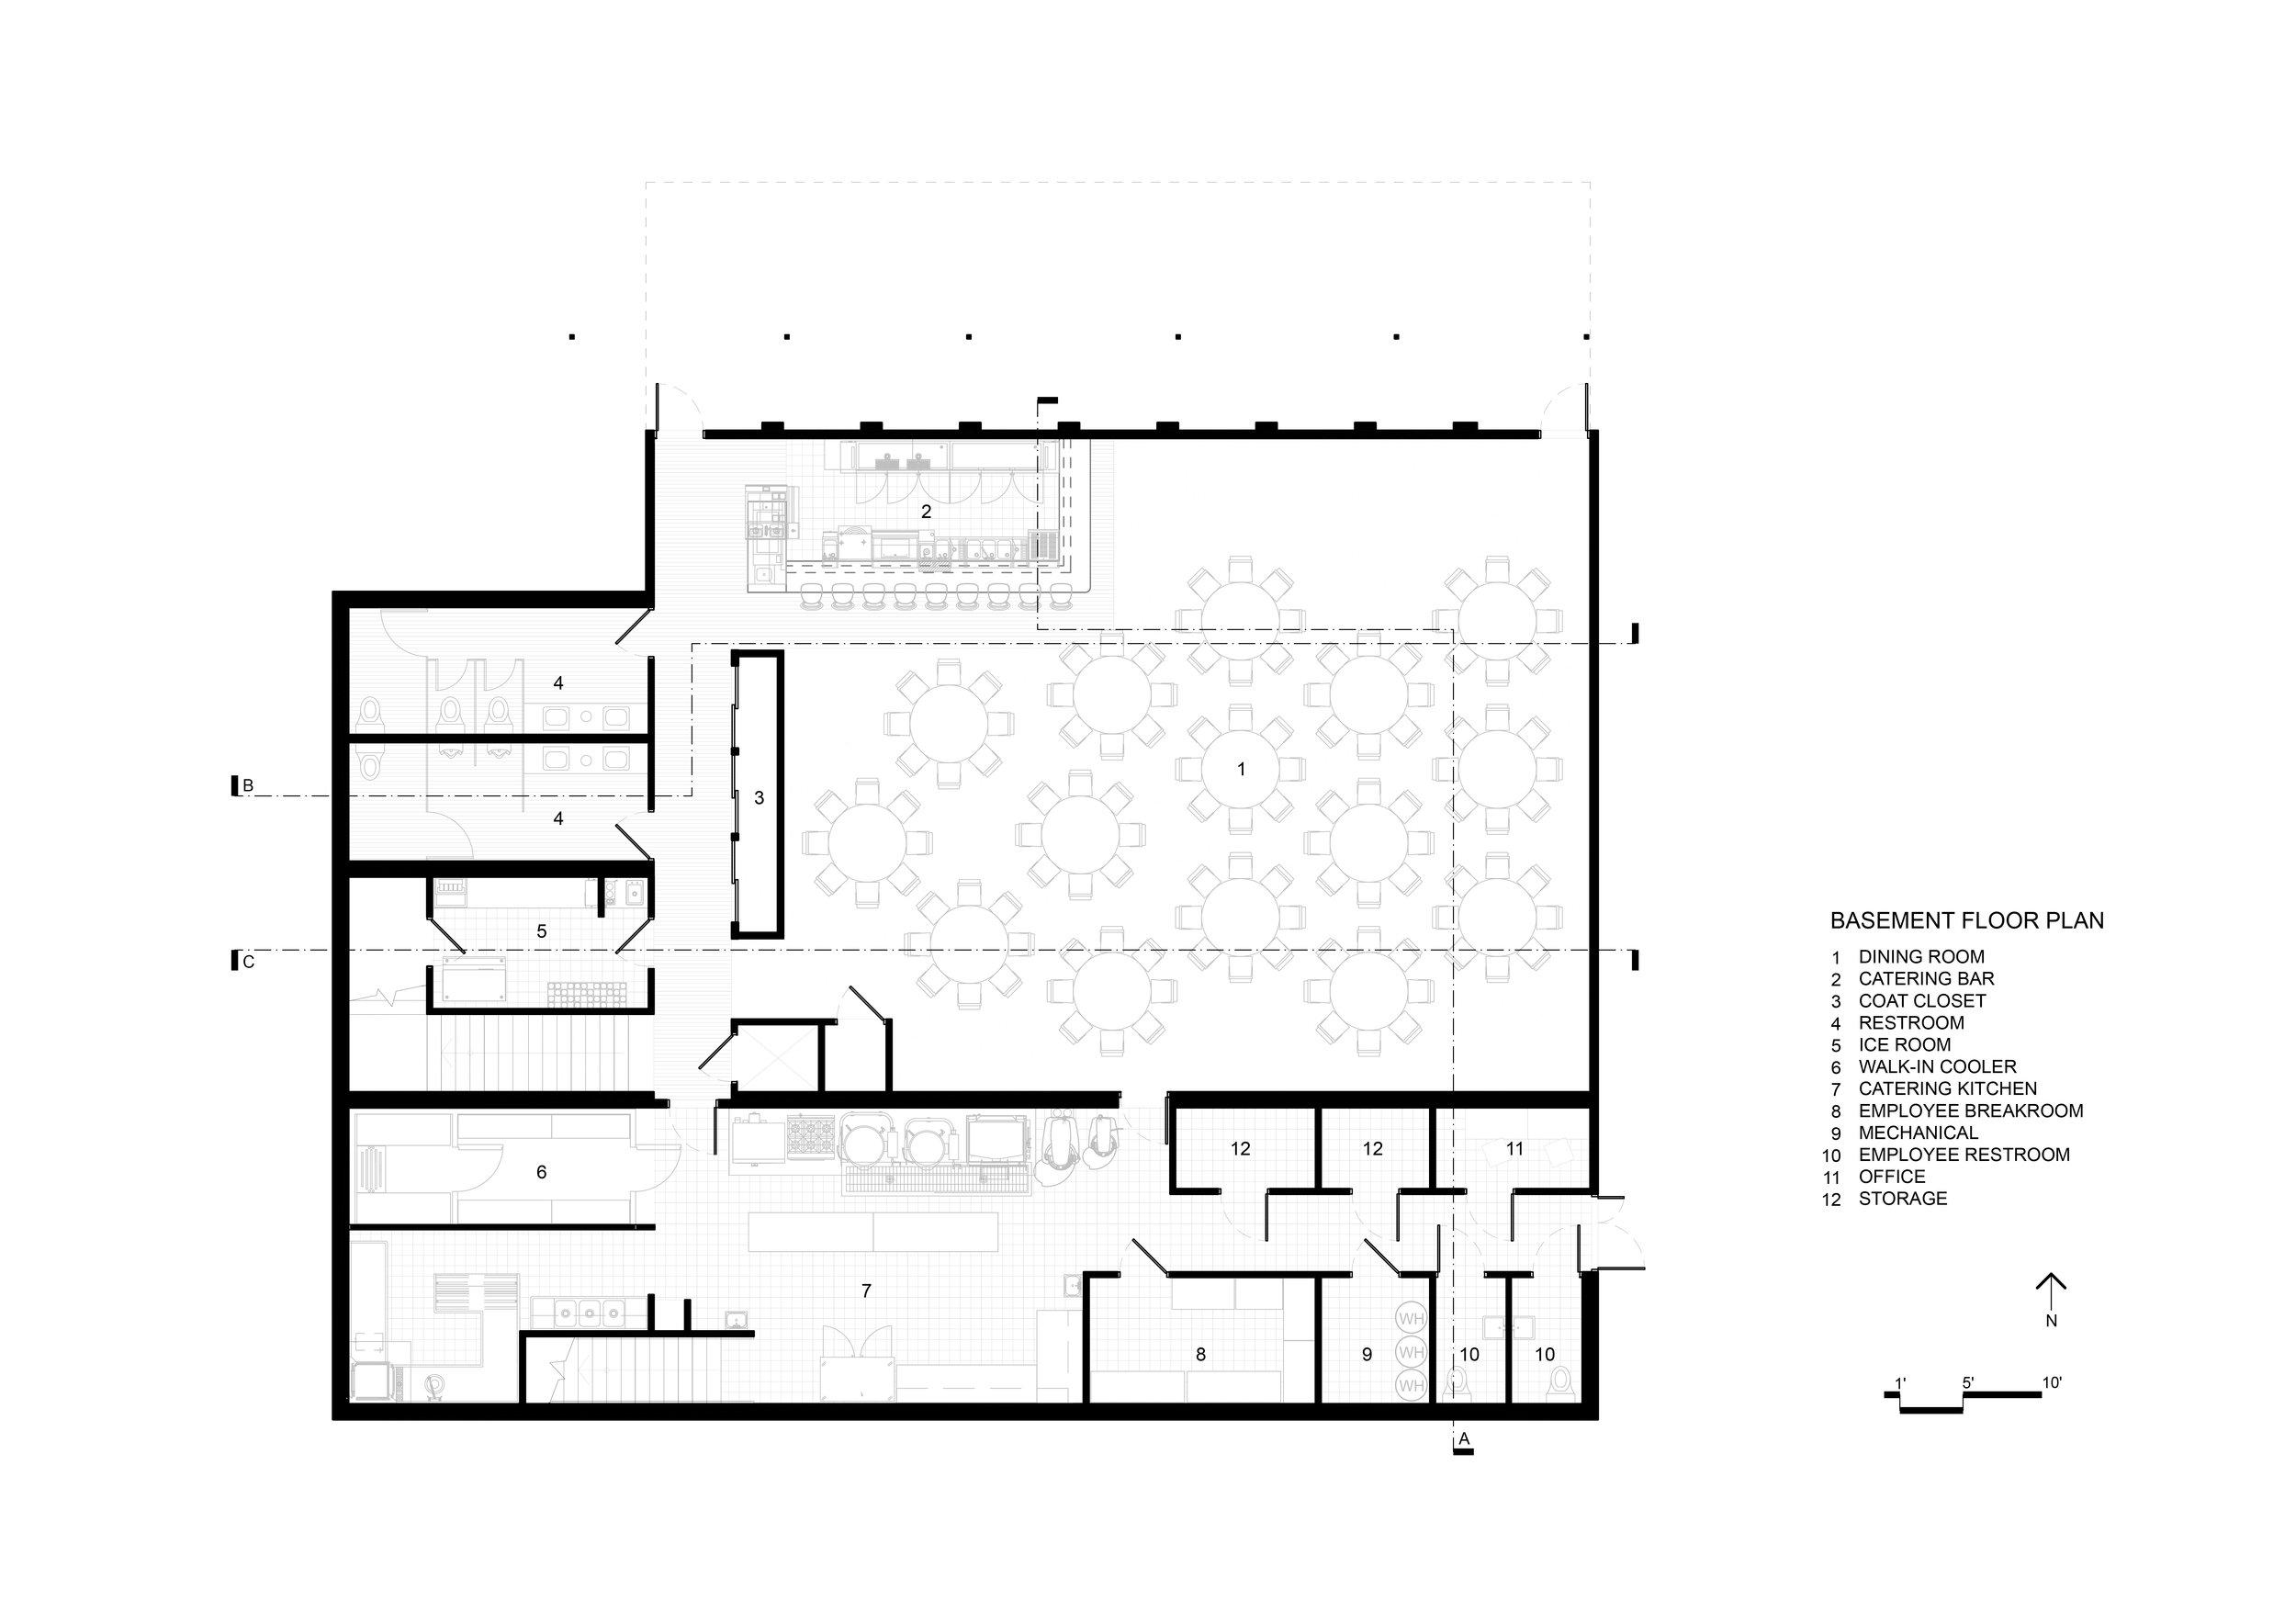 basement floor plan.jpg